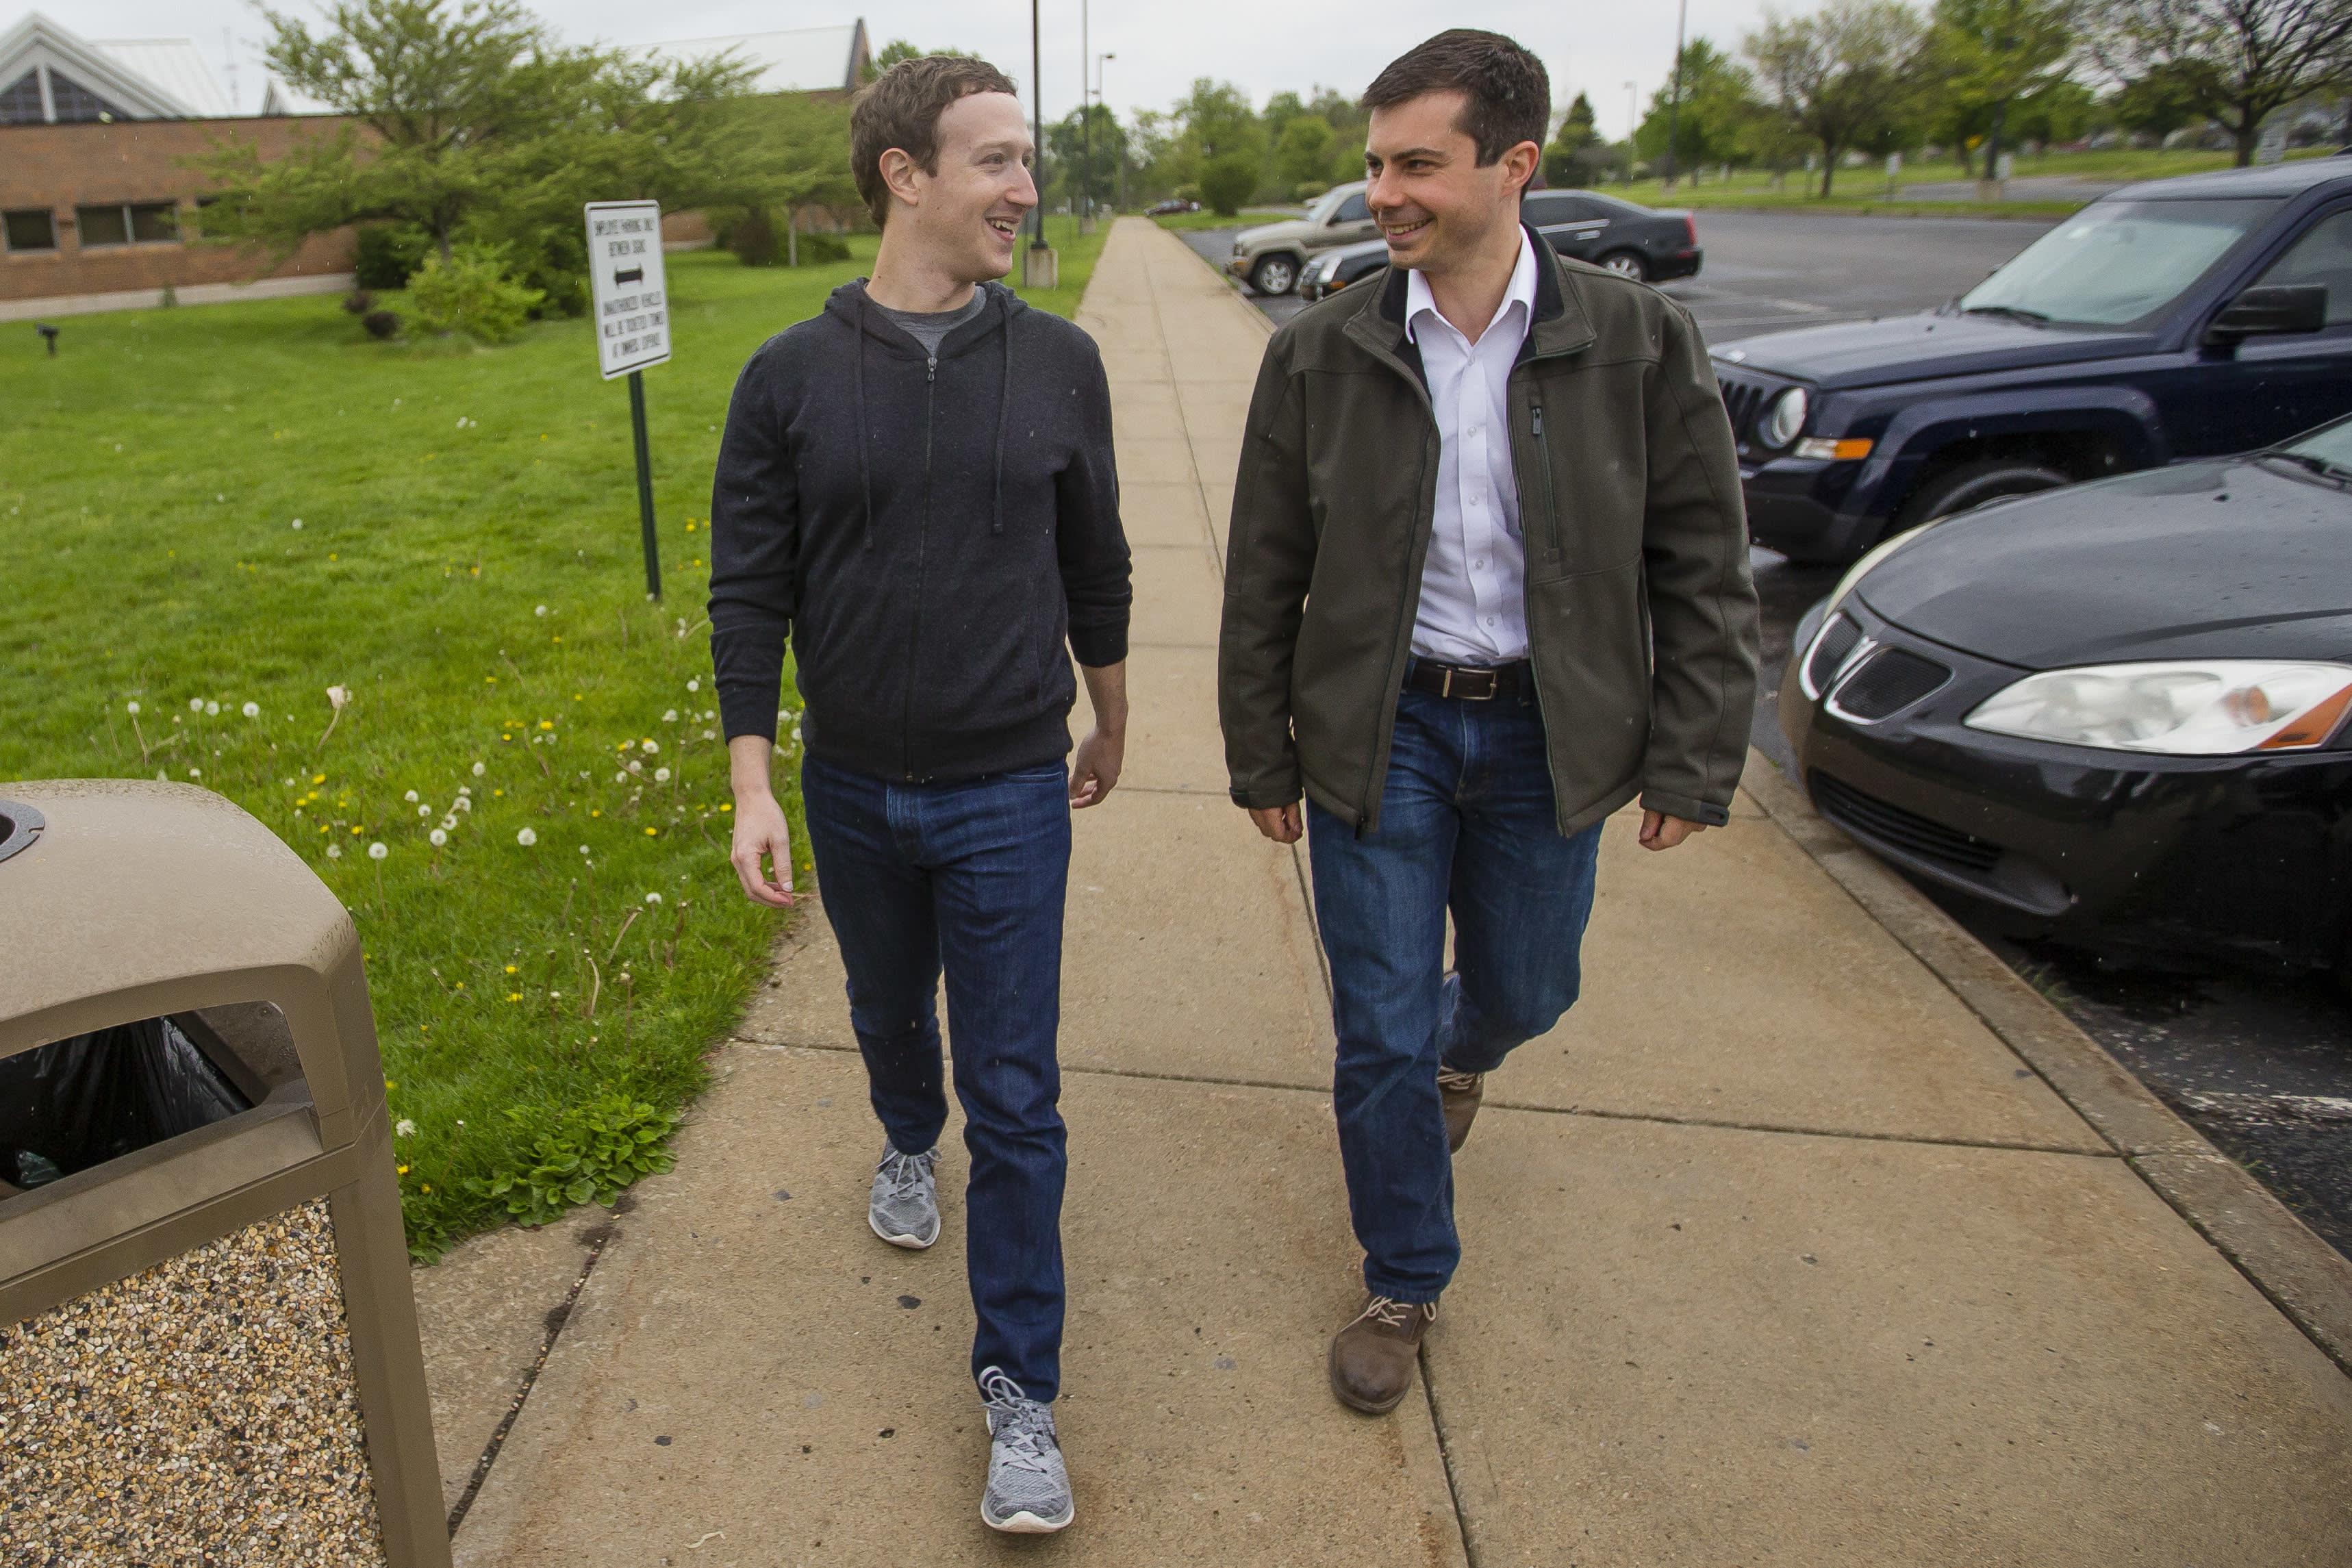 Pete Buttigieg says Facebook CEO Mark Zuckerberg has too much power